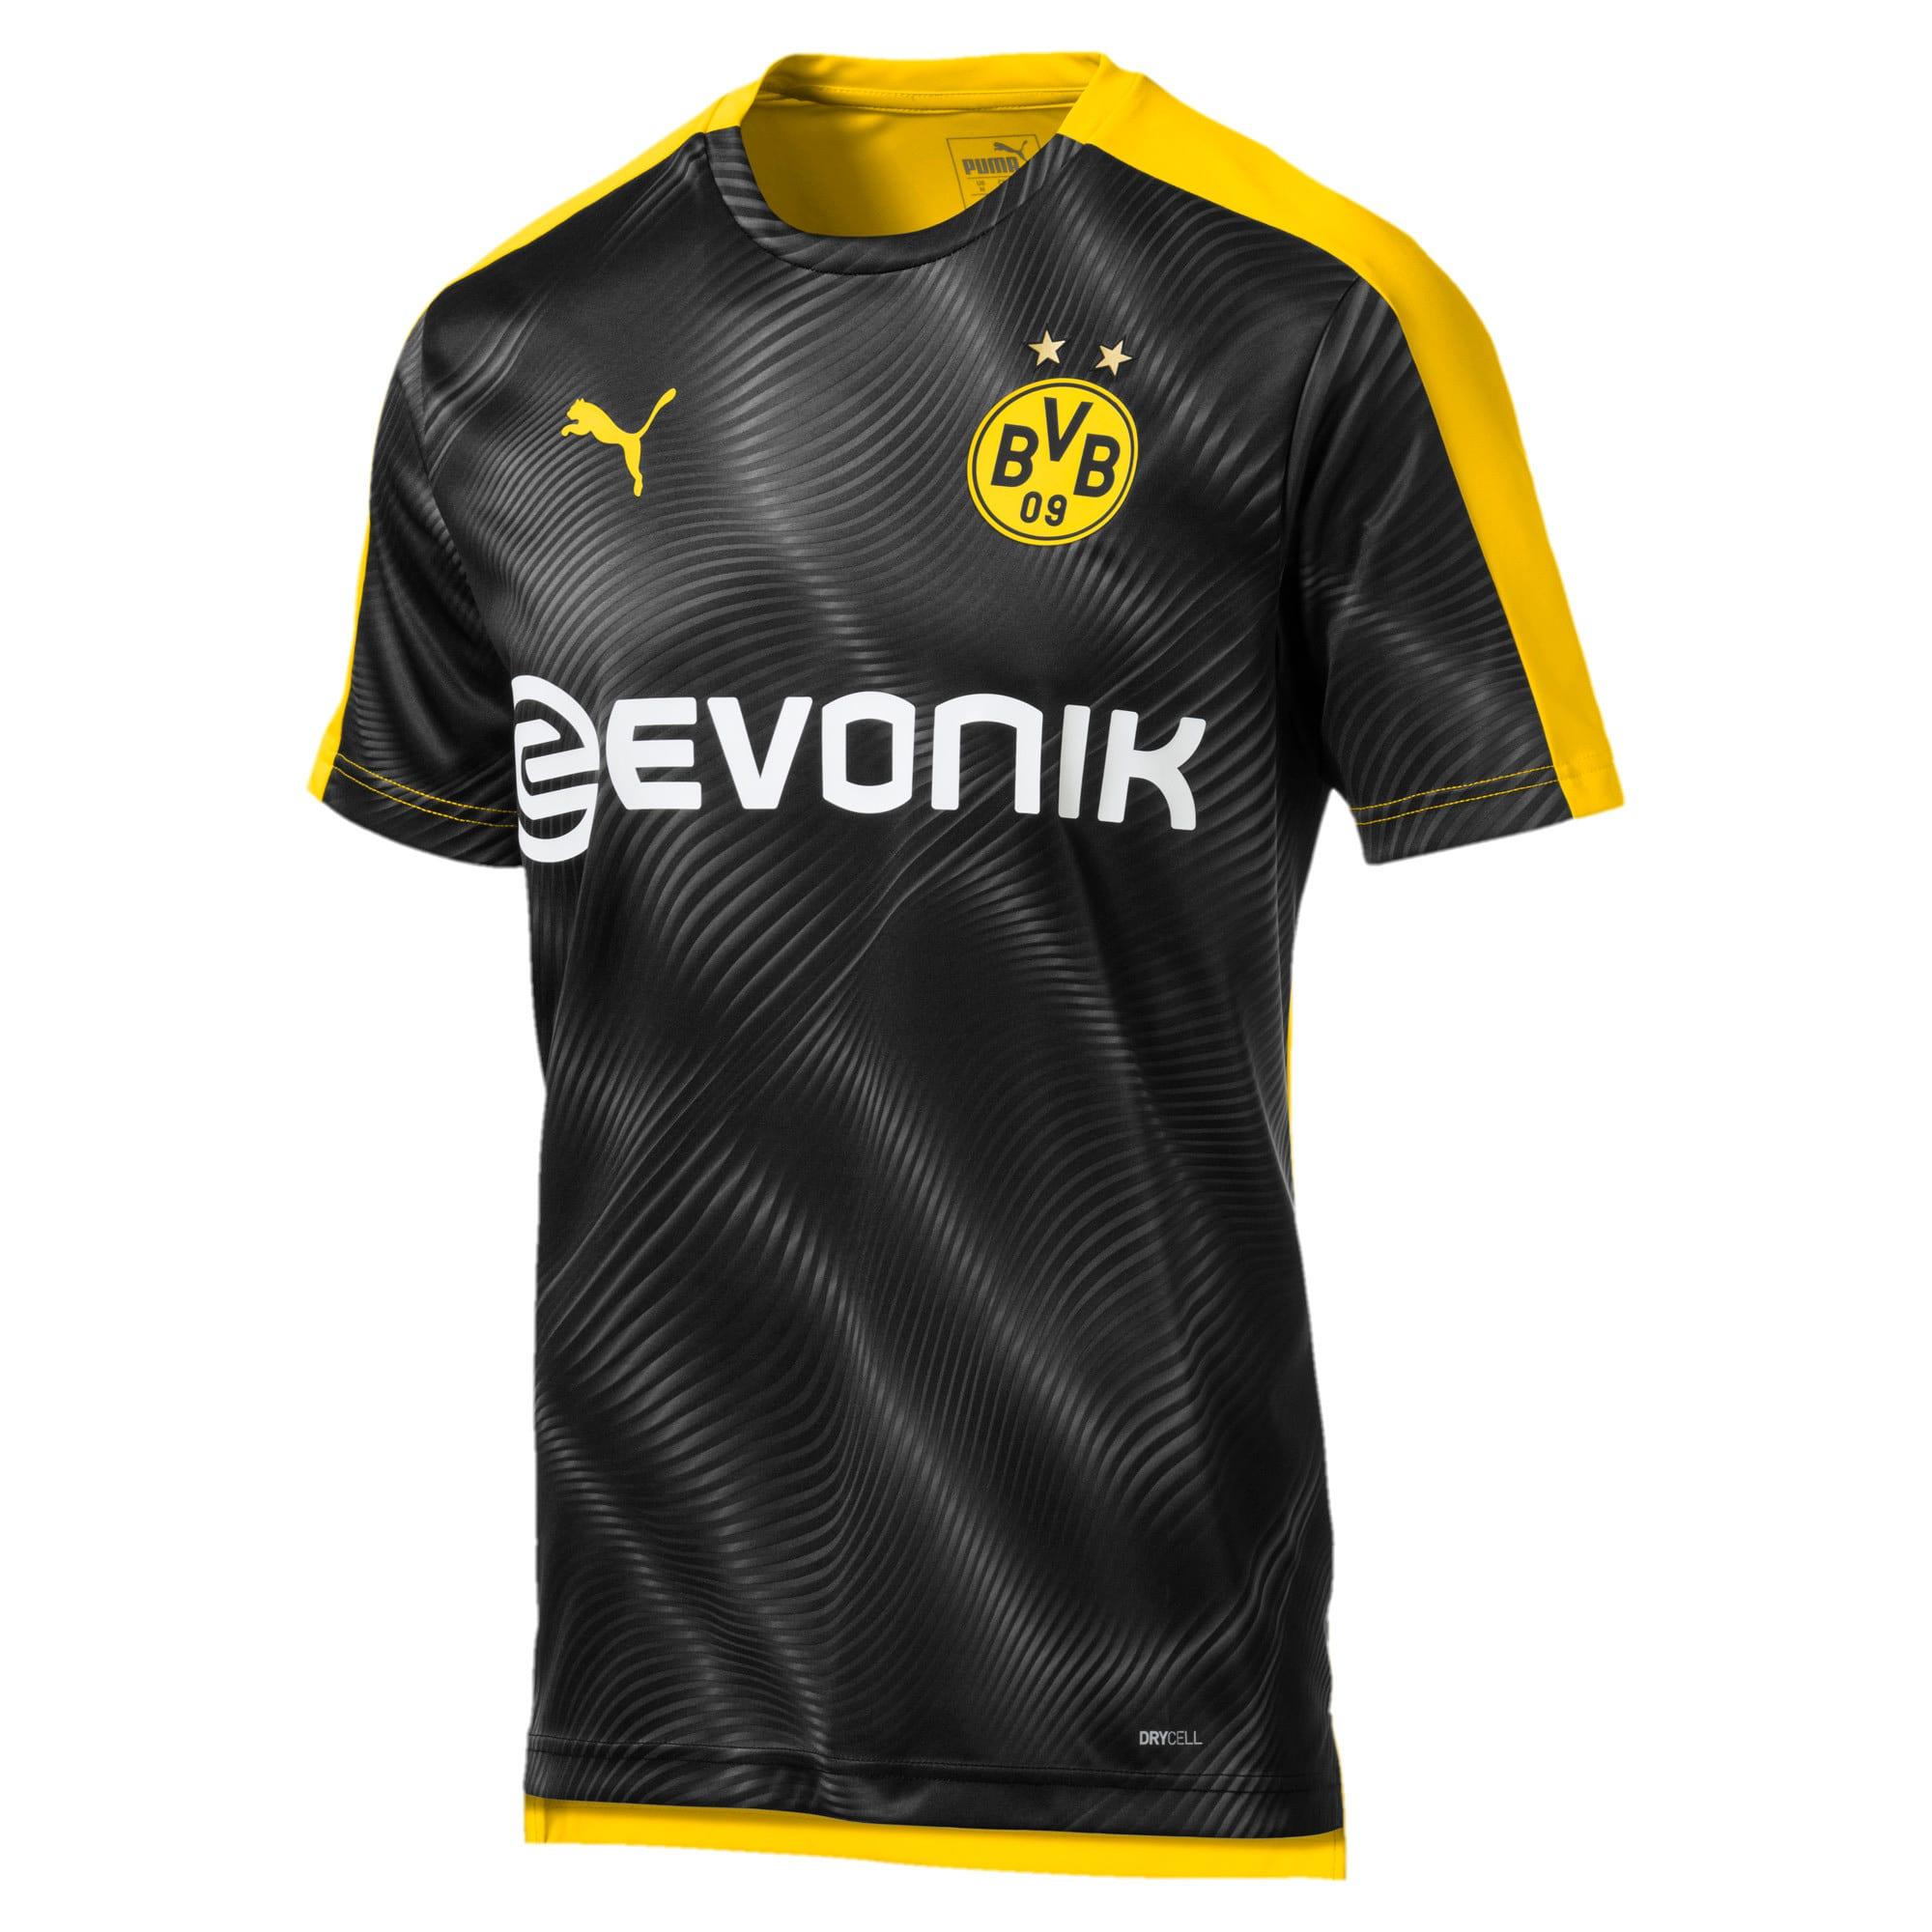 Thumbnail 1 of BVB Men's League Stadium Jersey, Cyber Yellow-Puma Black, medium